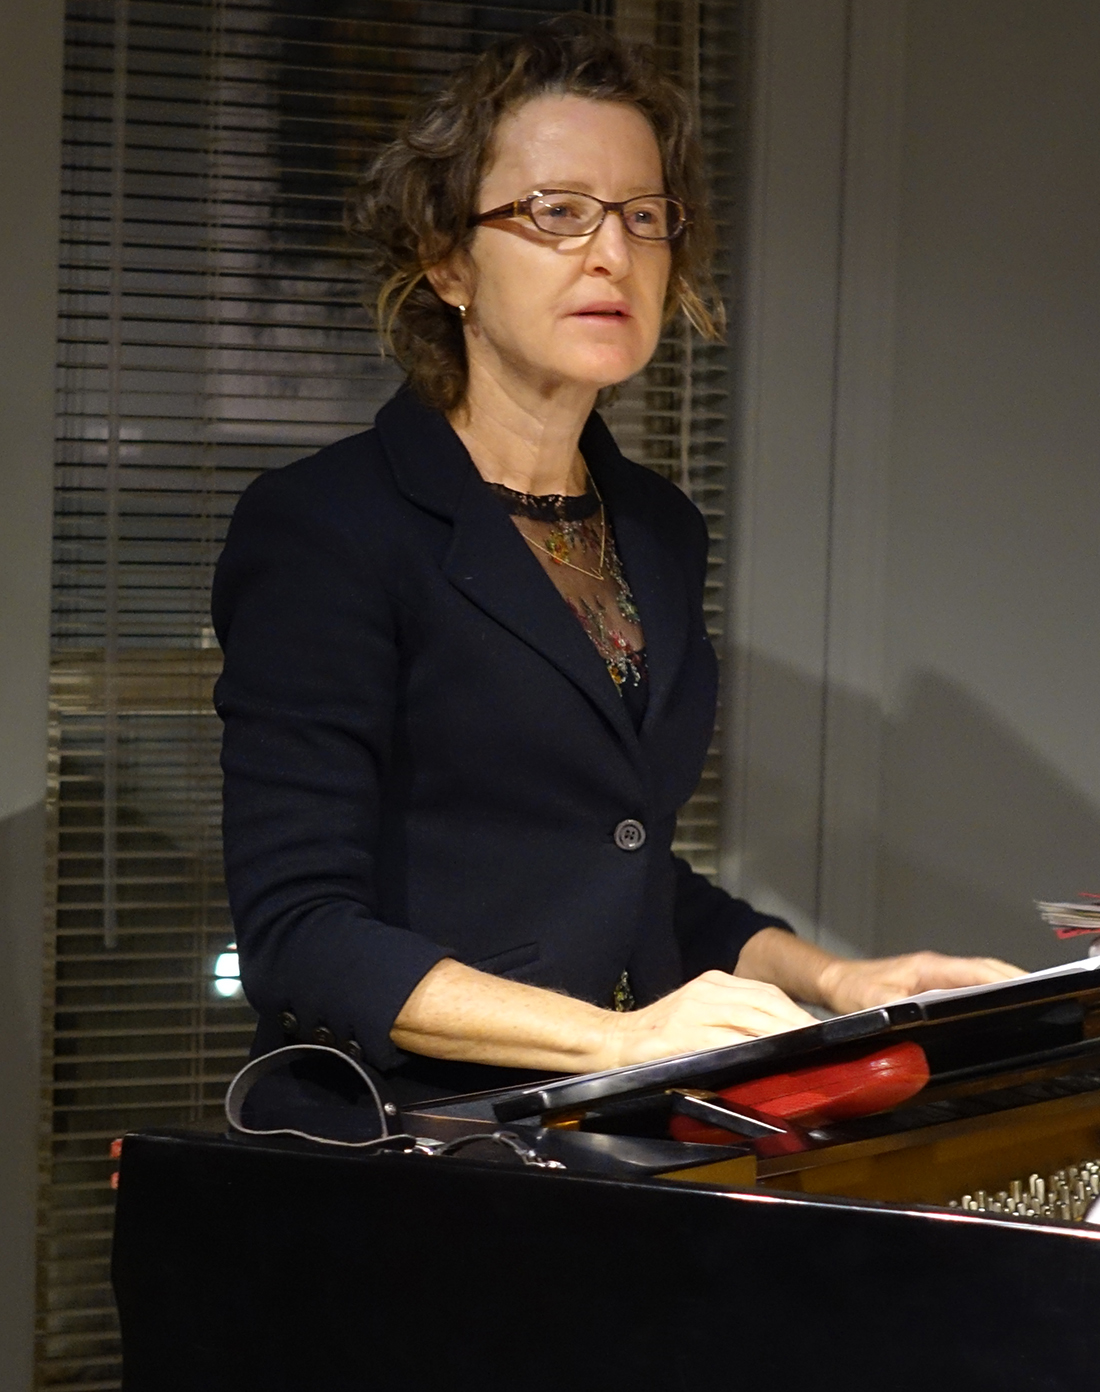 Myra Melford at Edgefest 2014